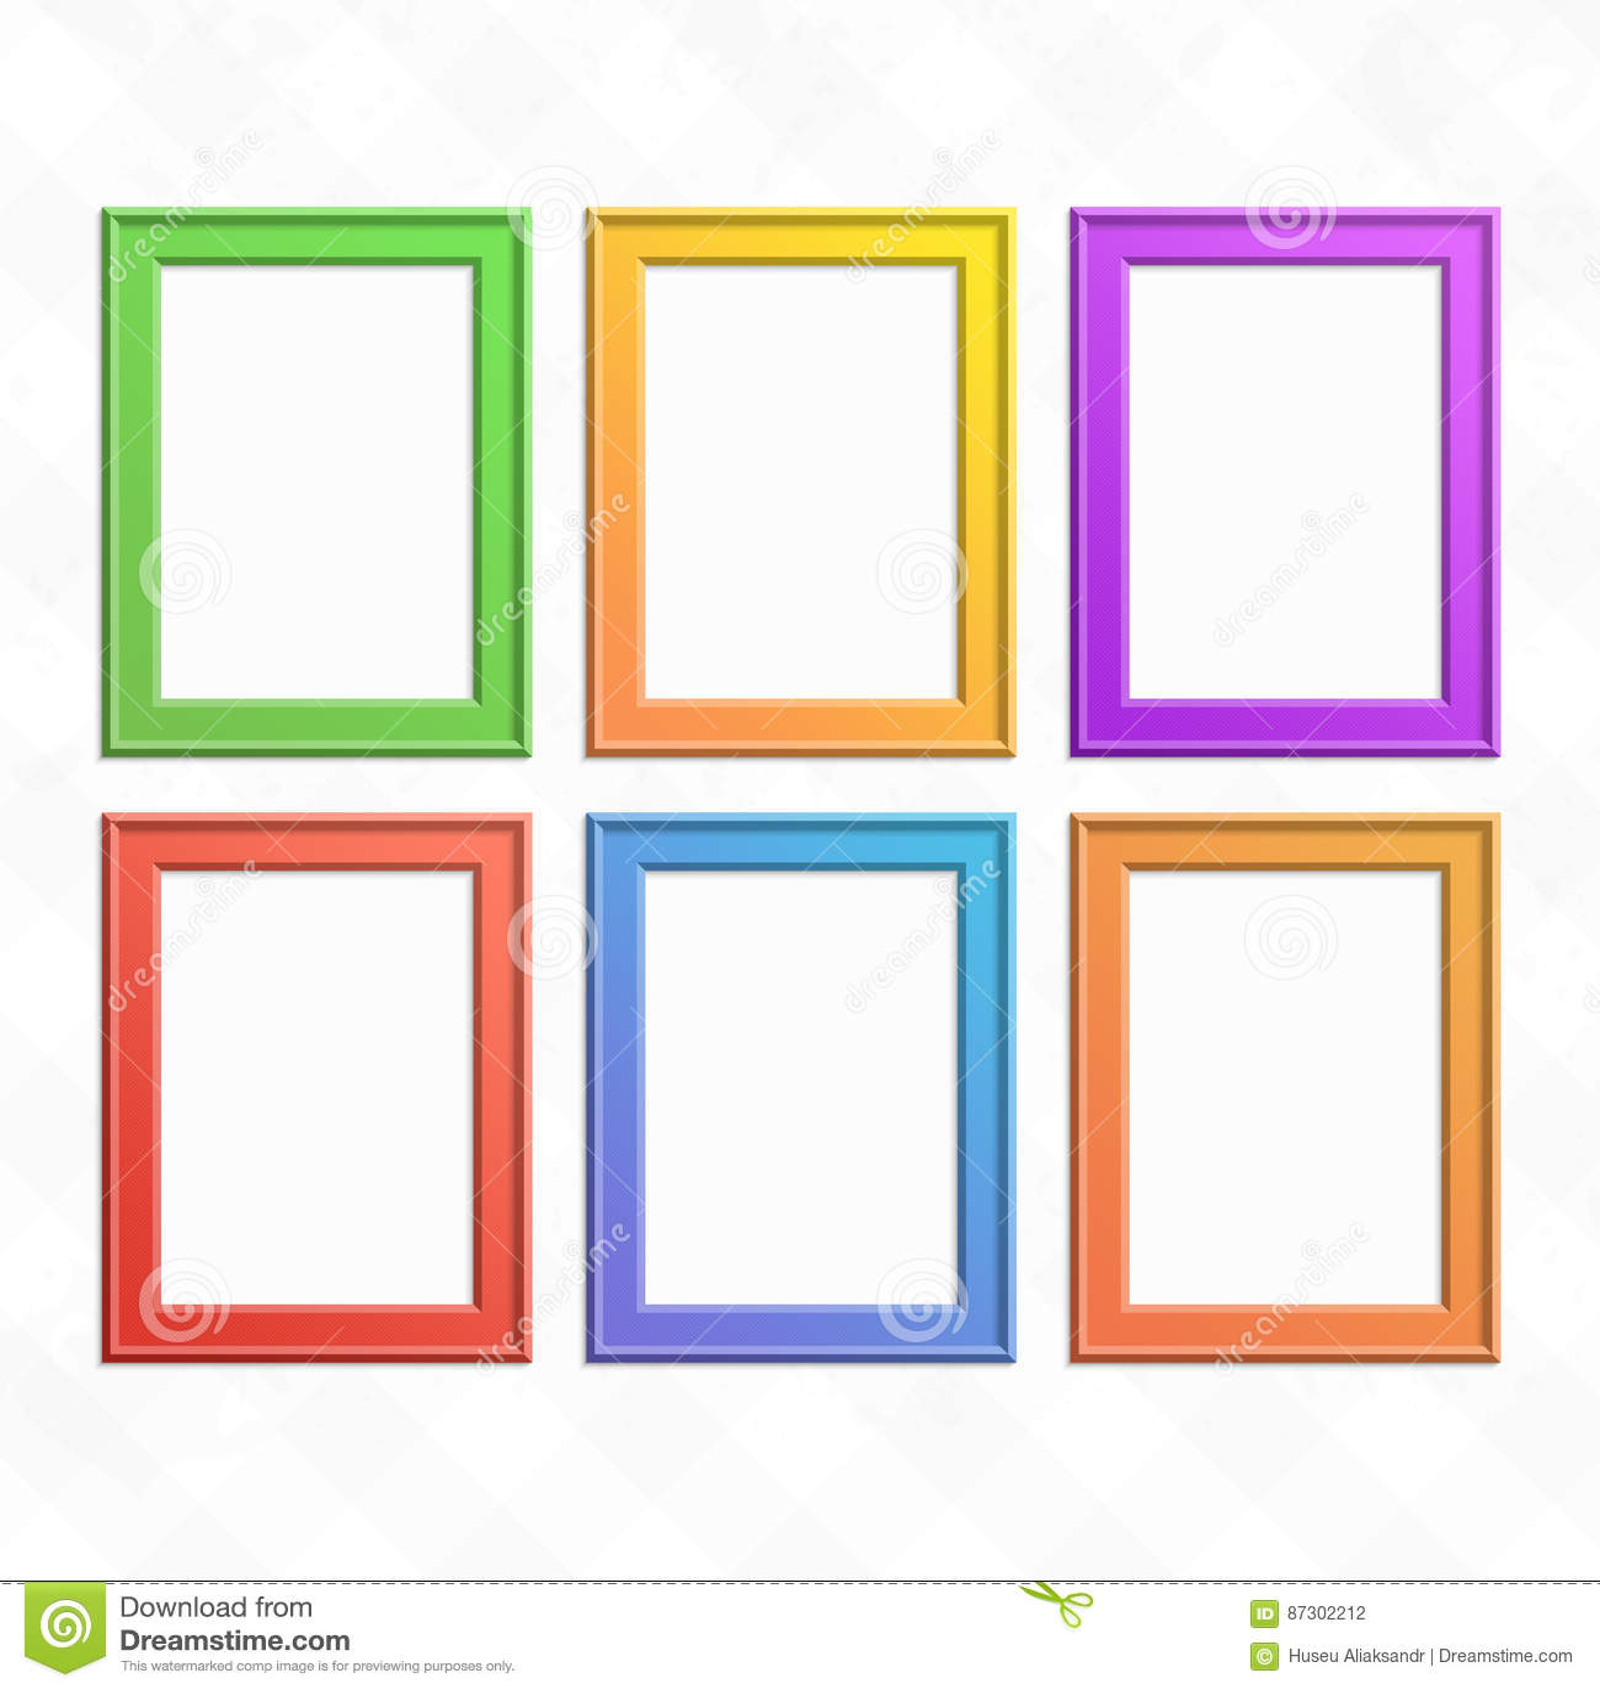 Wood frames set free vector - Set Of Colorful Wooden Frames Stock Vector